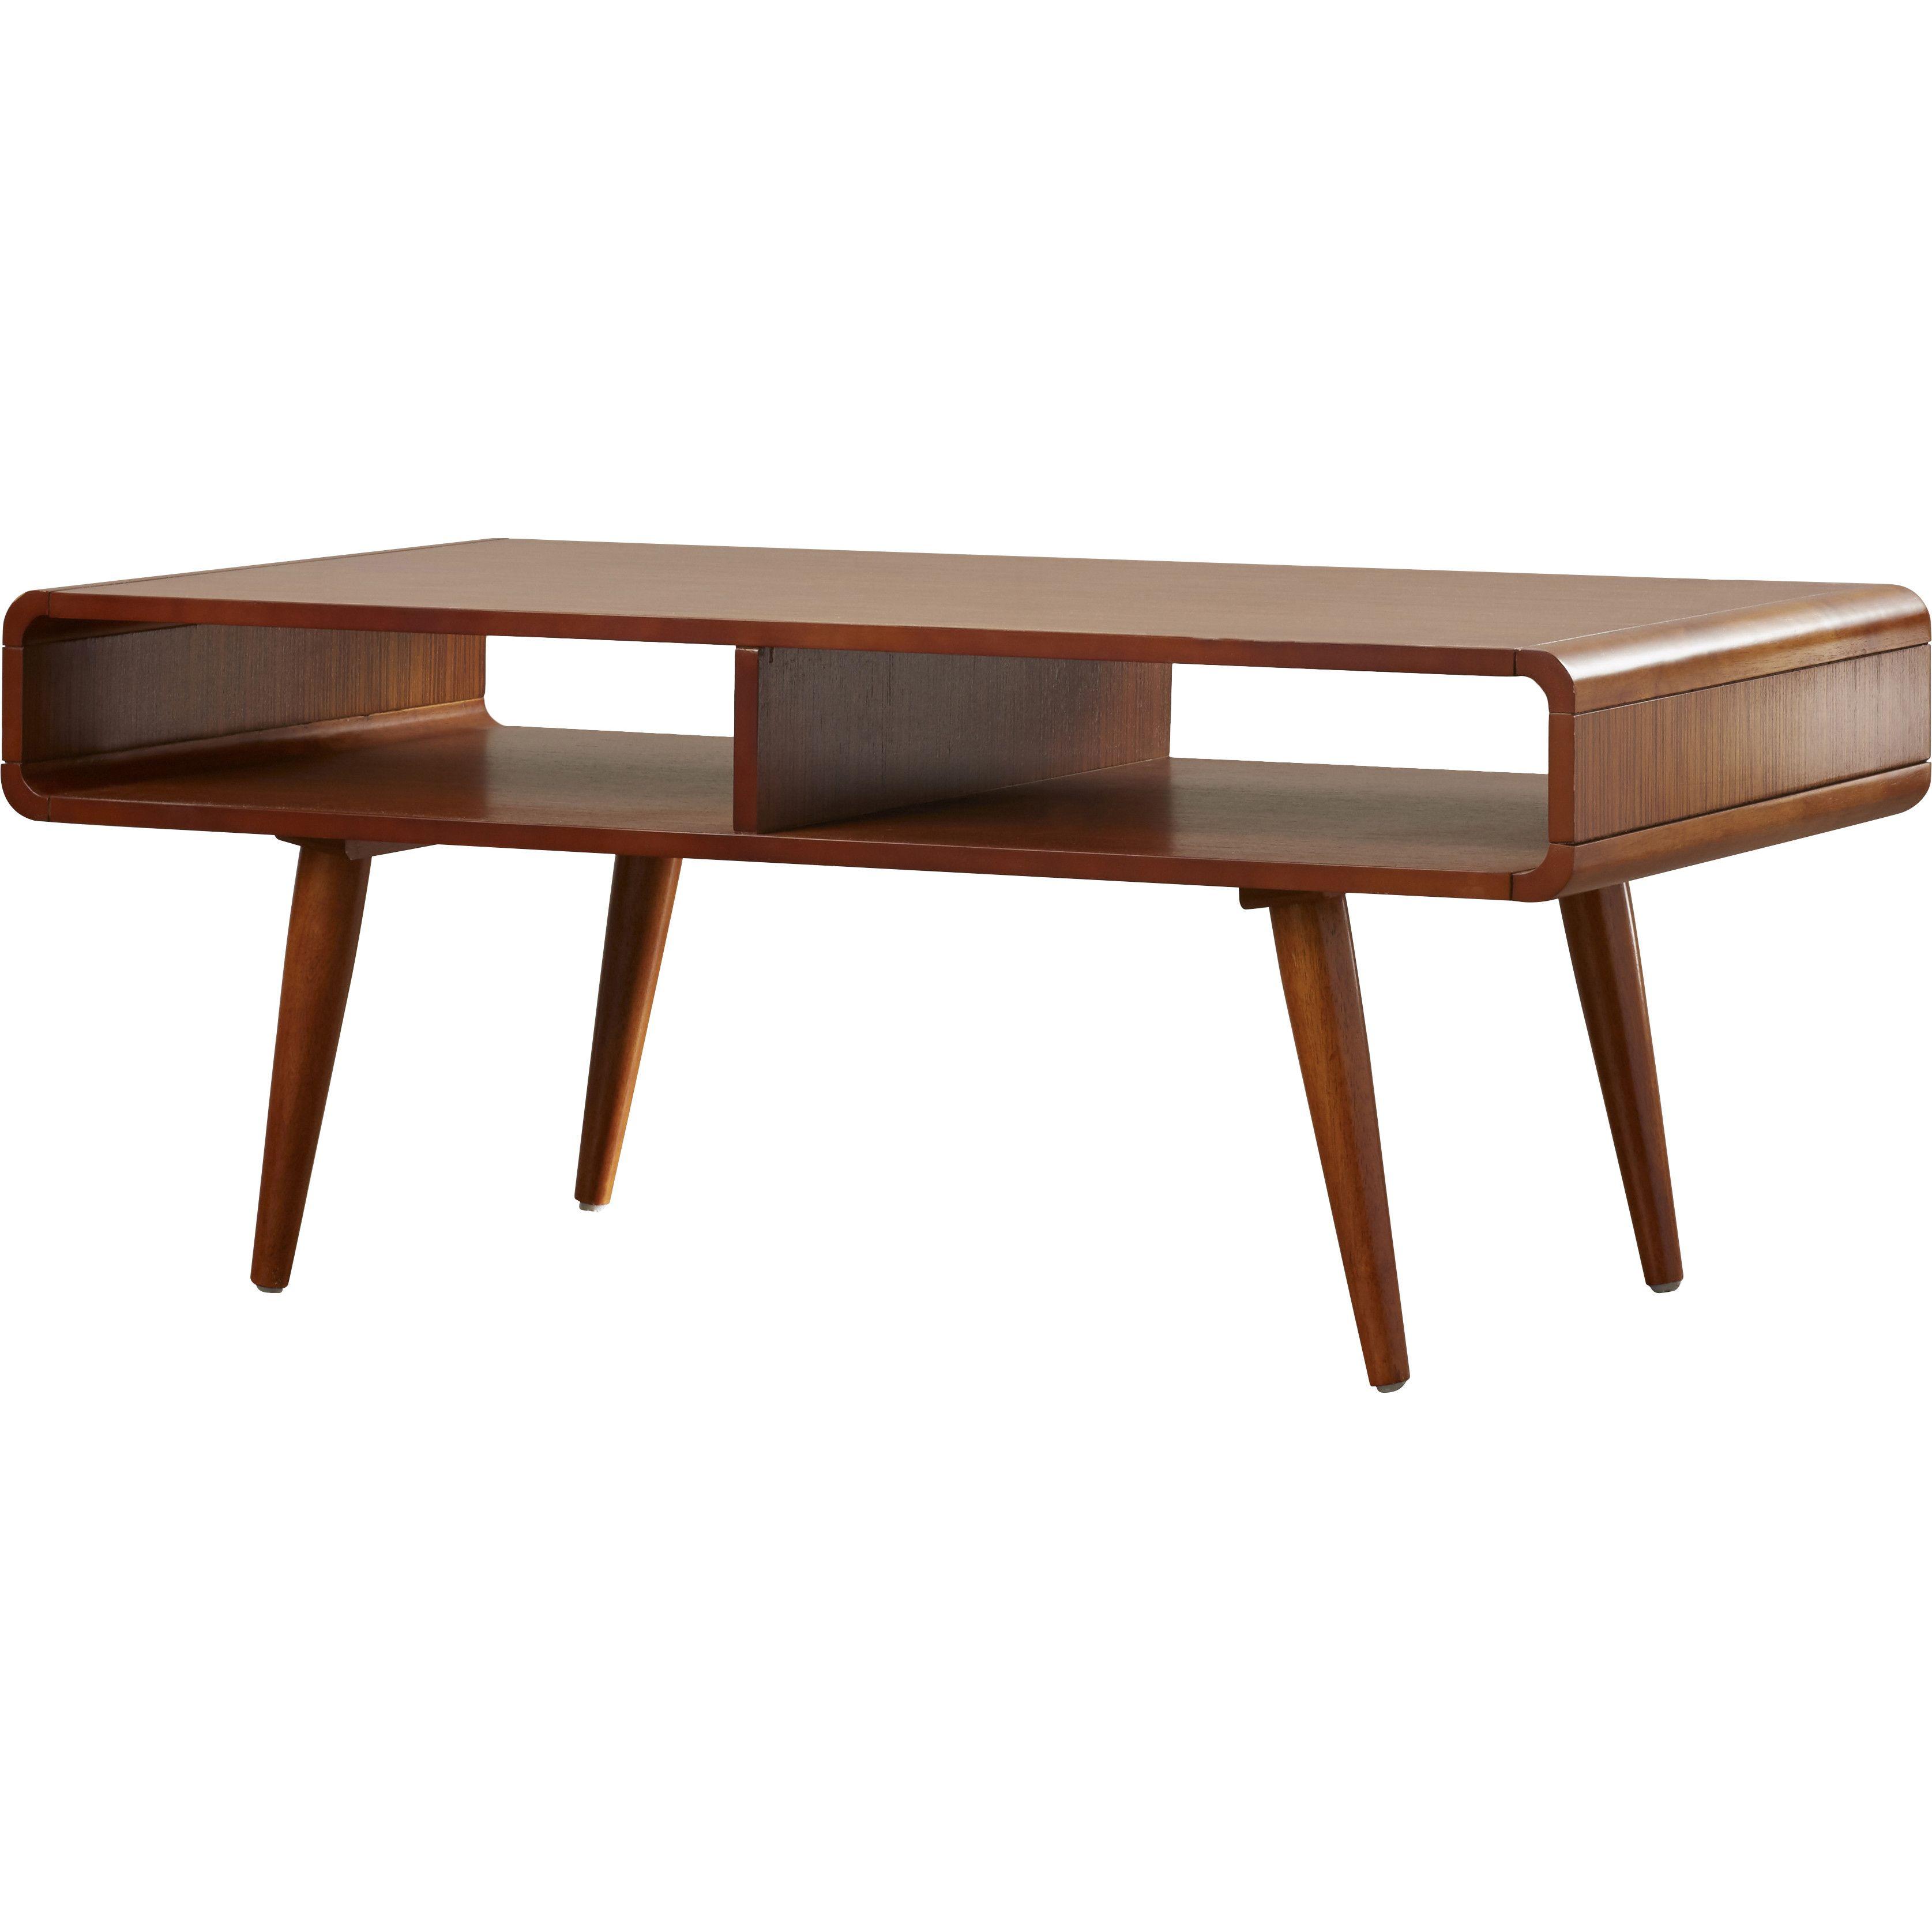 Corrigan Studio Reg Curtis Coffee Table Coffee Table Mid Century Coffee Table Coffee Table With Storage [ 3350 x 3350 Pixel ]